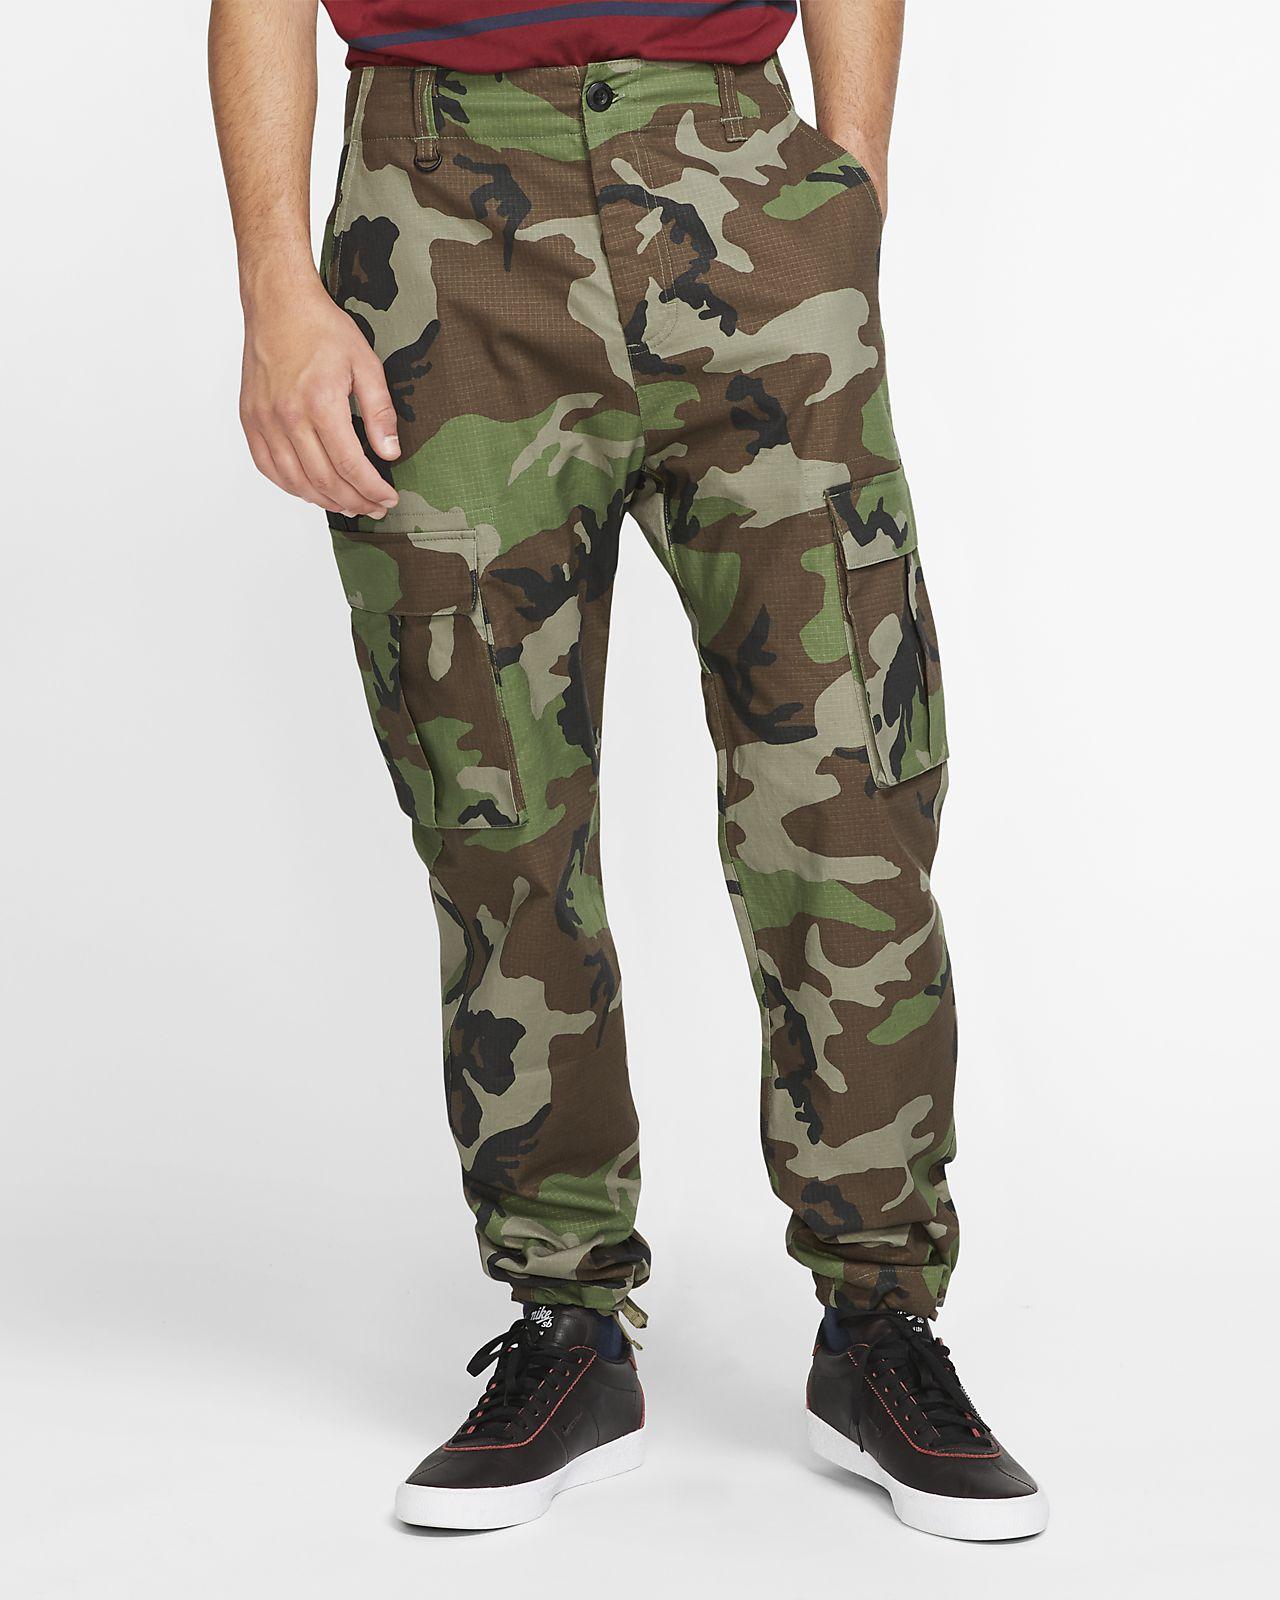 Nike SB Flex FTM Pantalón militar de skateboard de camuflaje - Hombre